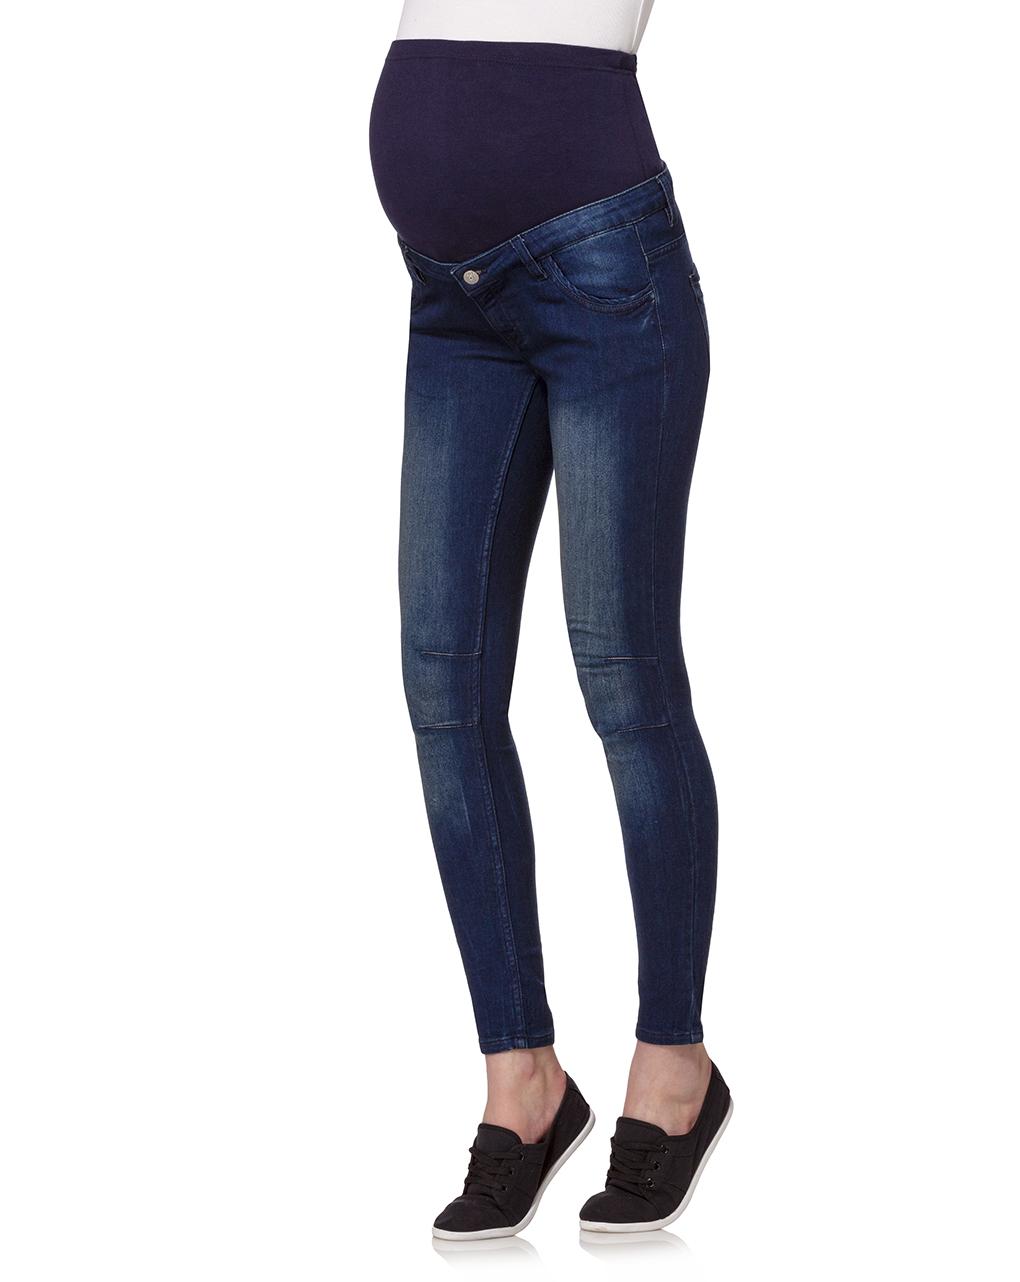 Pantalone skinny in denim blu scuro - Prénatal